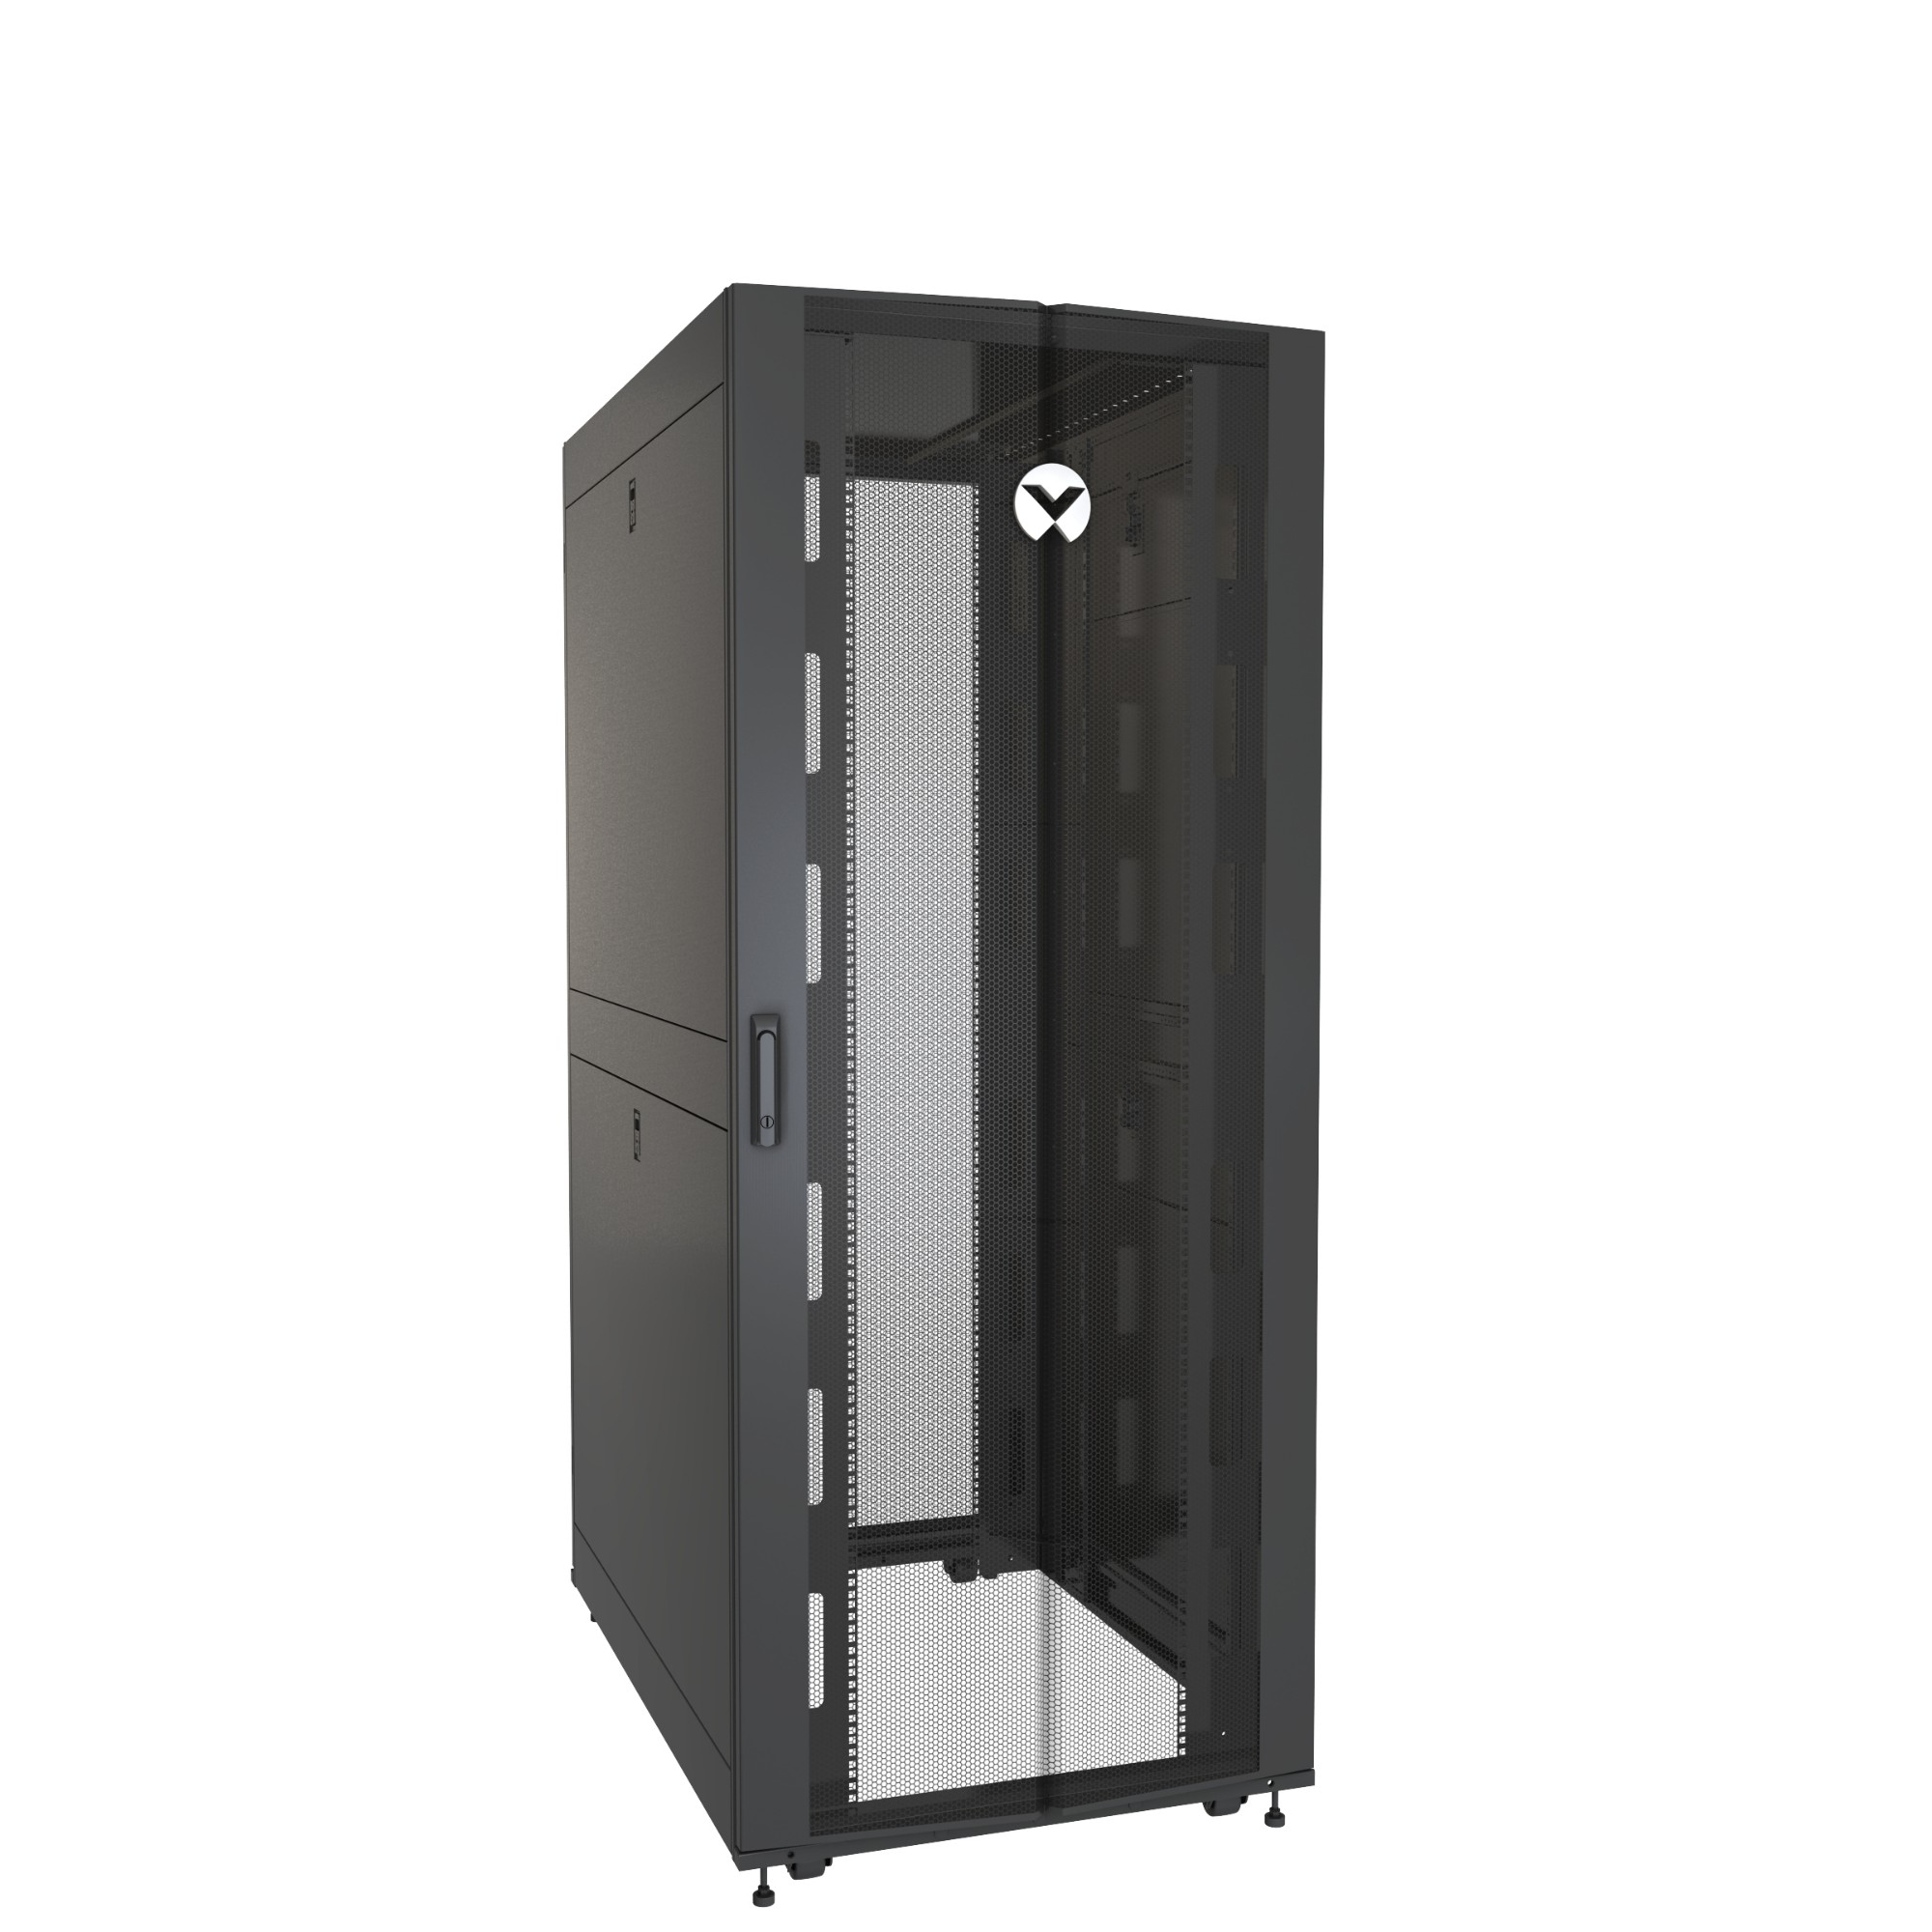 Vertiv VR3350 armario rack 42U Rack o bastidor independiente Negro, Transparente